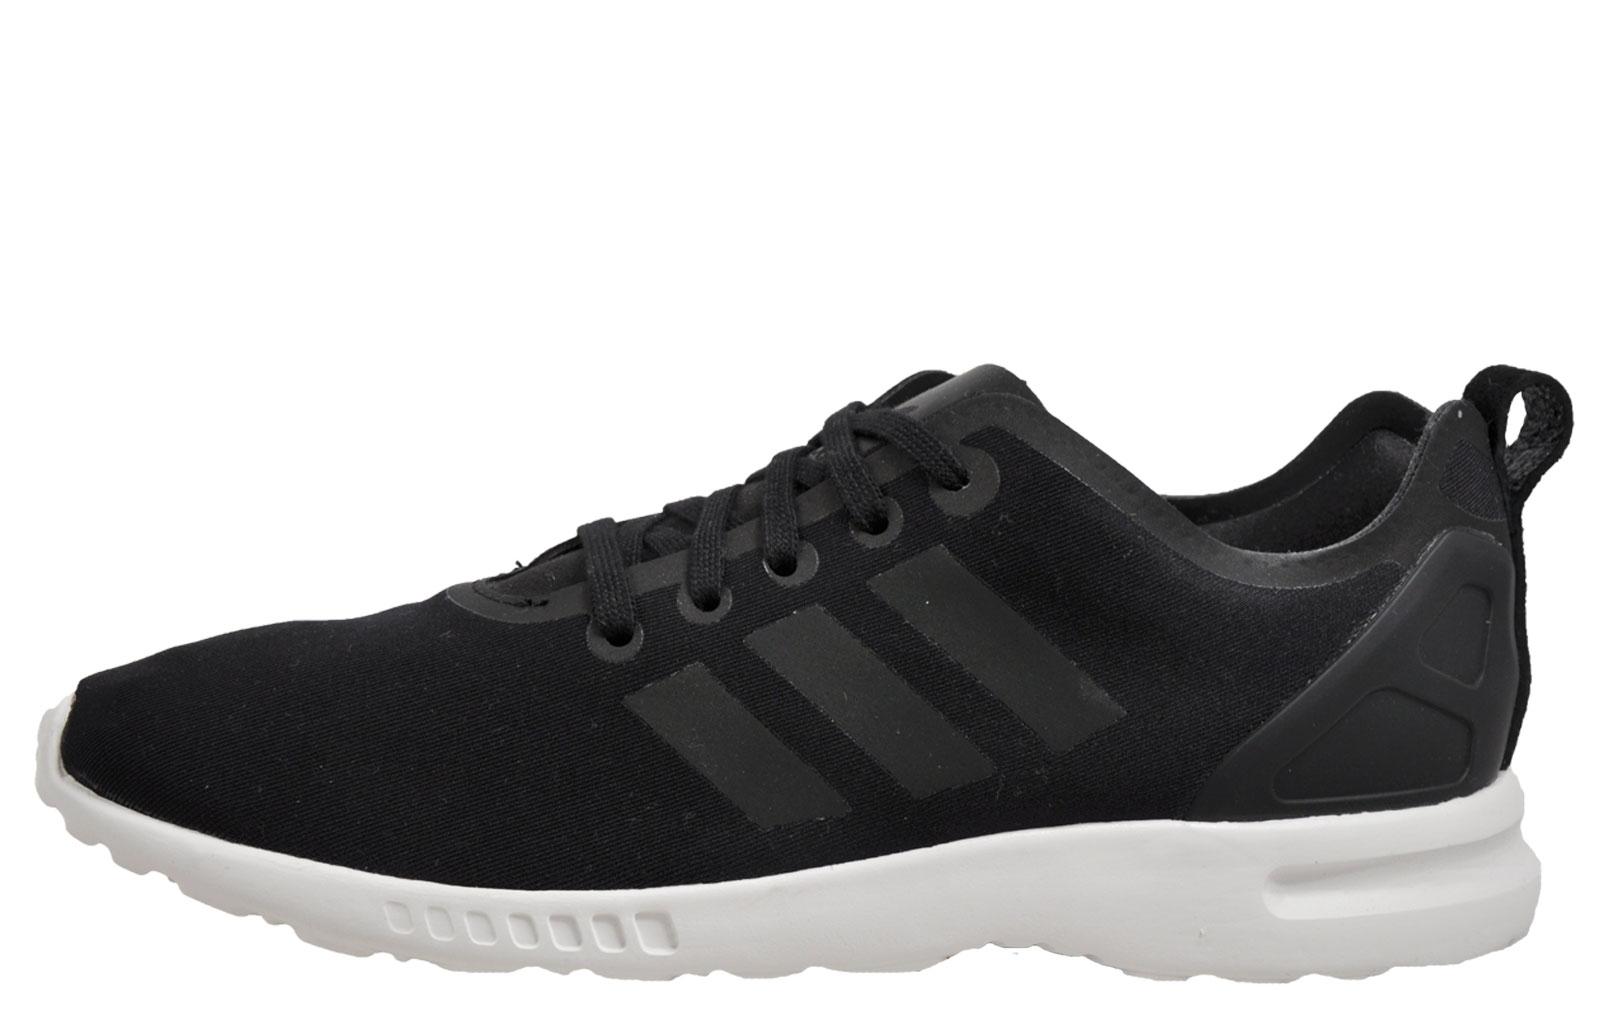 adidas zx flux torsion black and copper nz